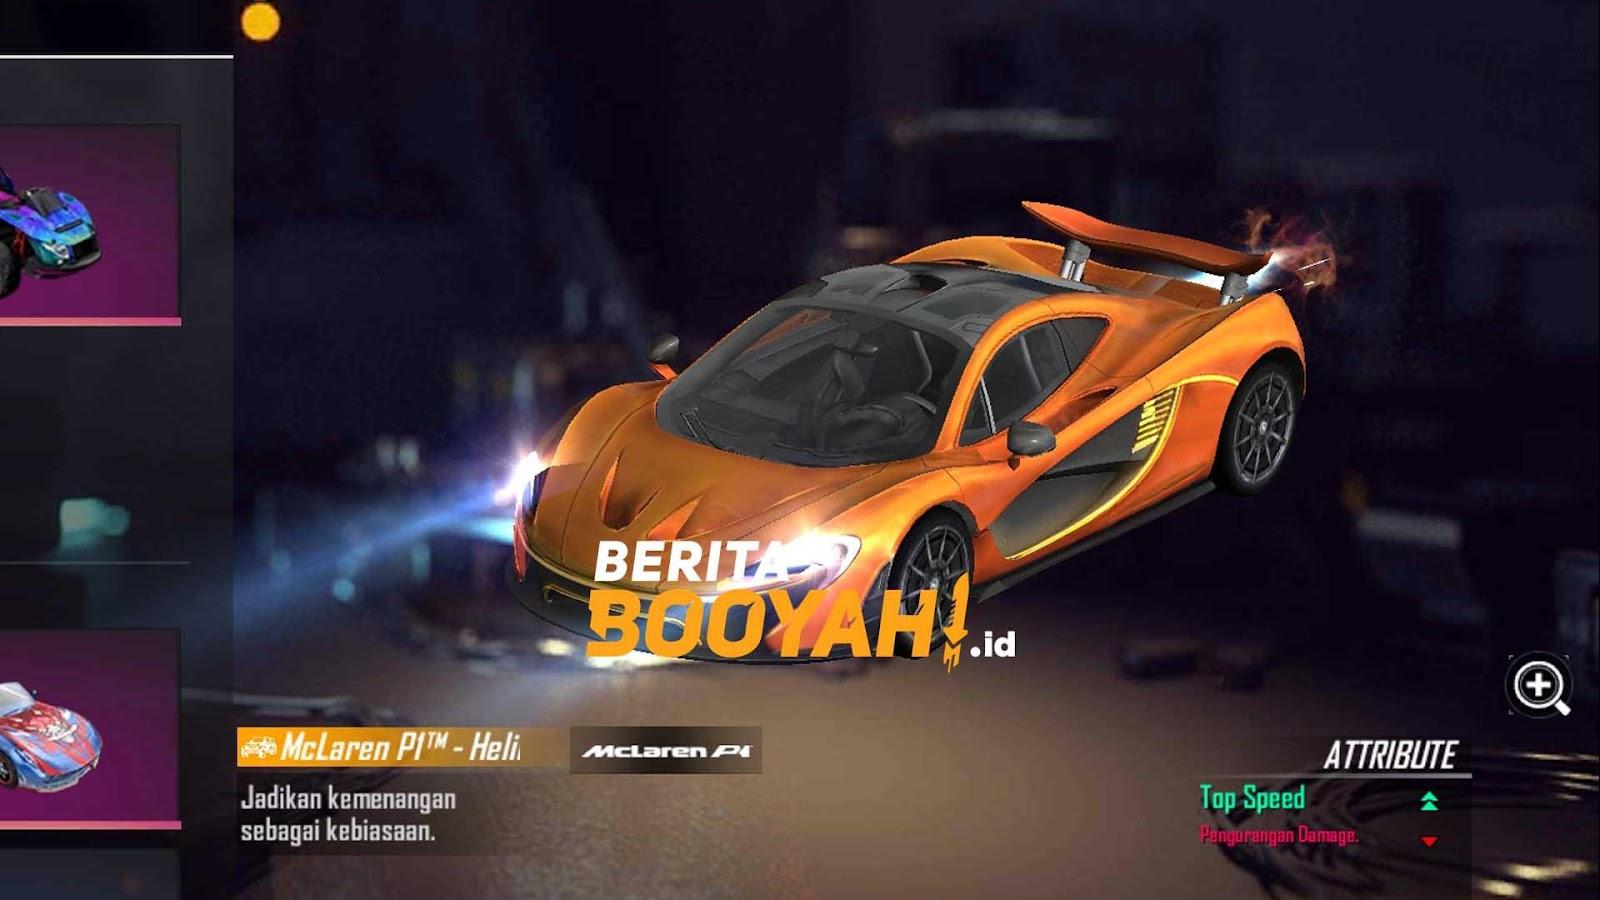 Free Fire X McLaren P1 สกินรถใหม่สุดหรู 2